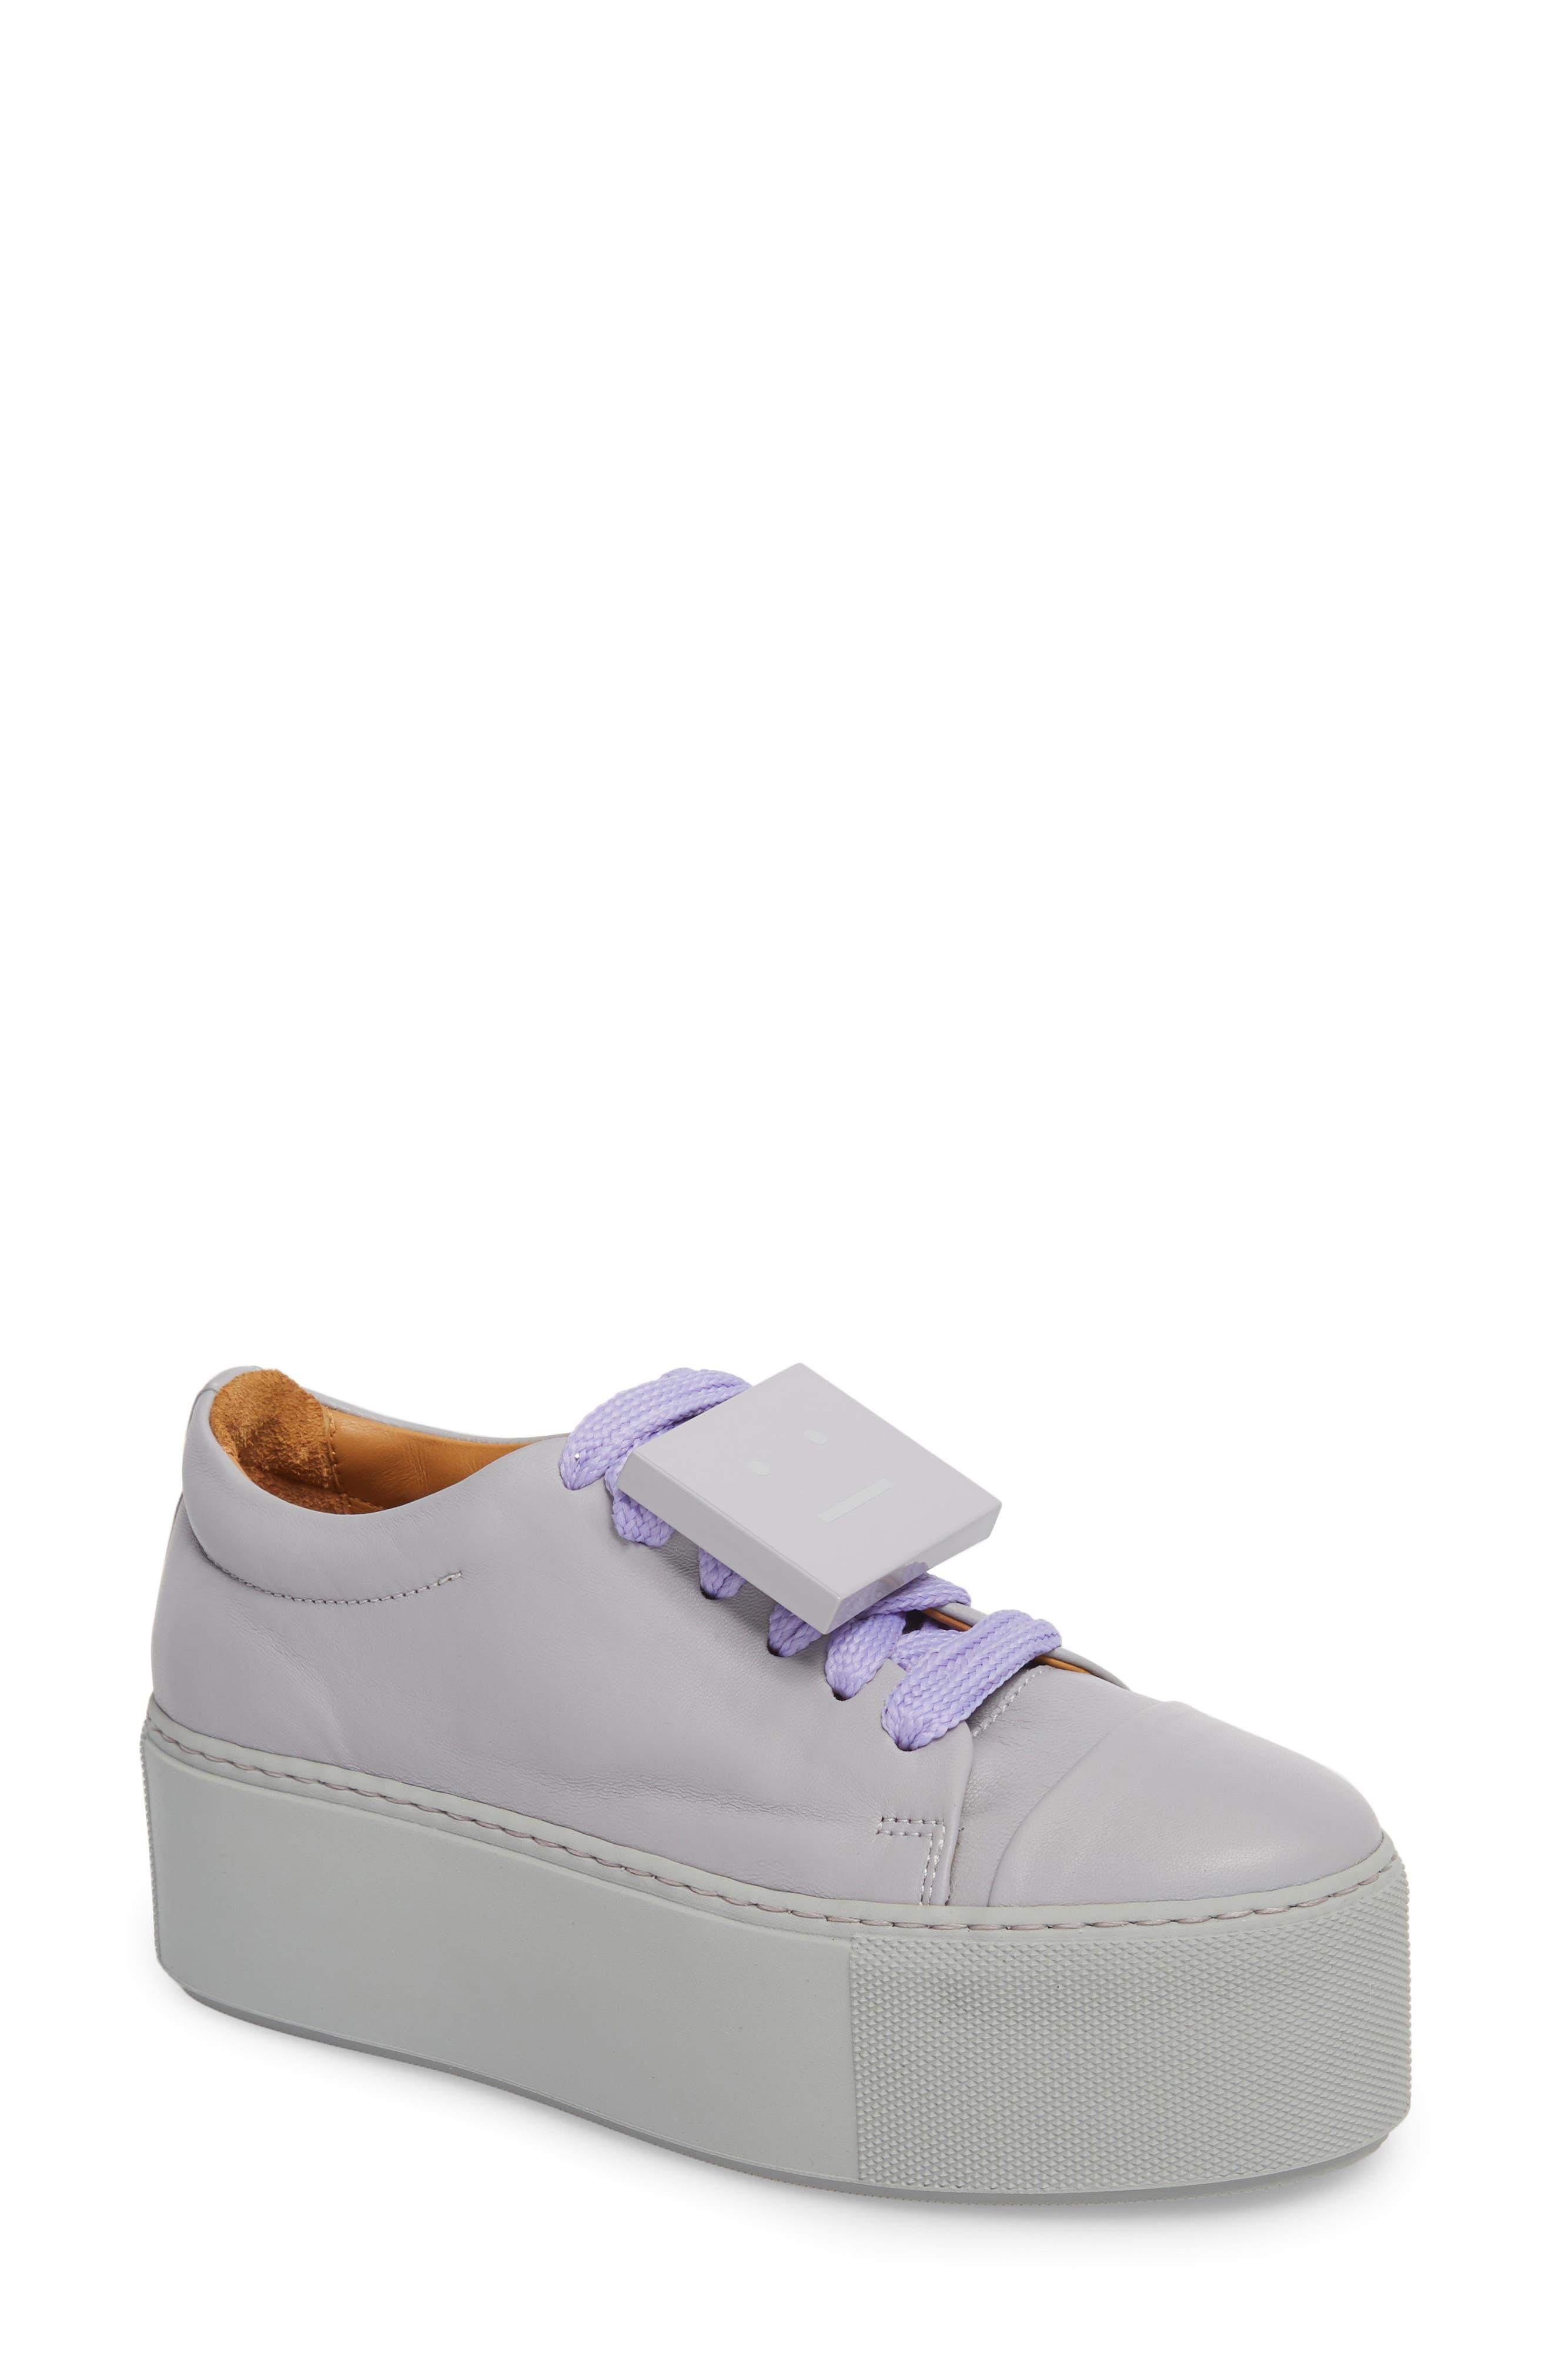 Acne Studios Drihanna Nappa Leather Platform Sneaker (Women)